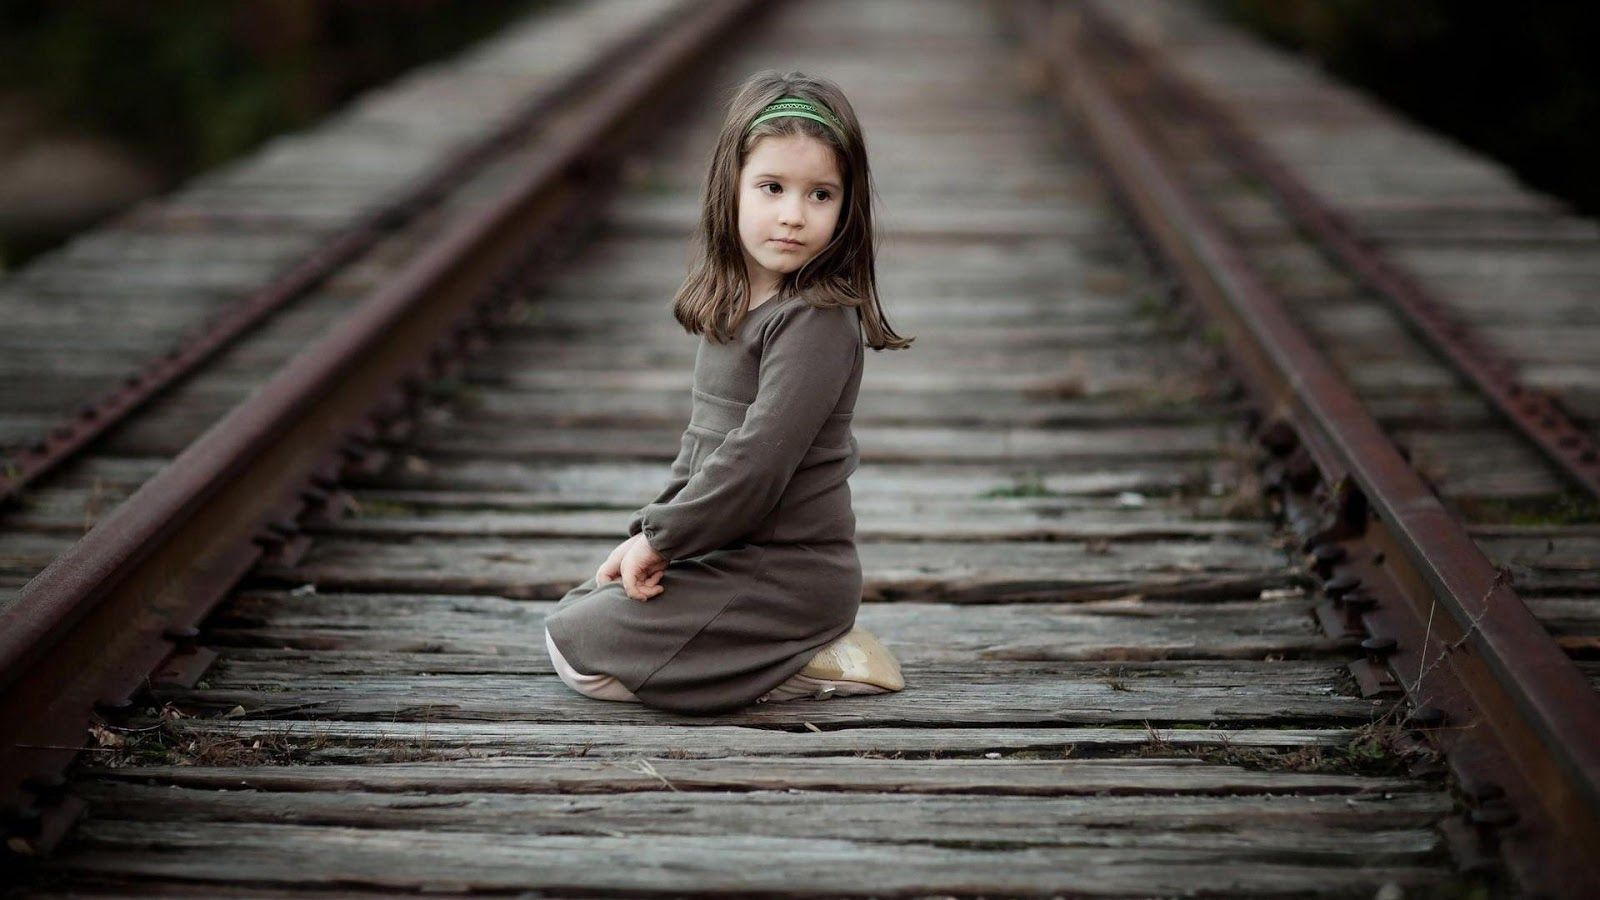 cute girl on the tracks